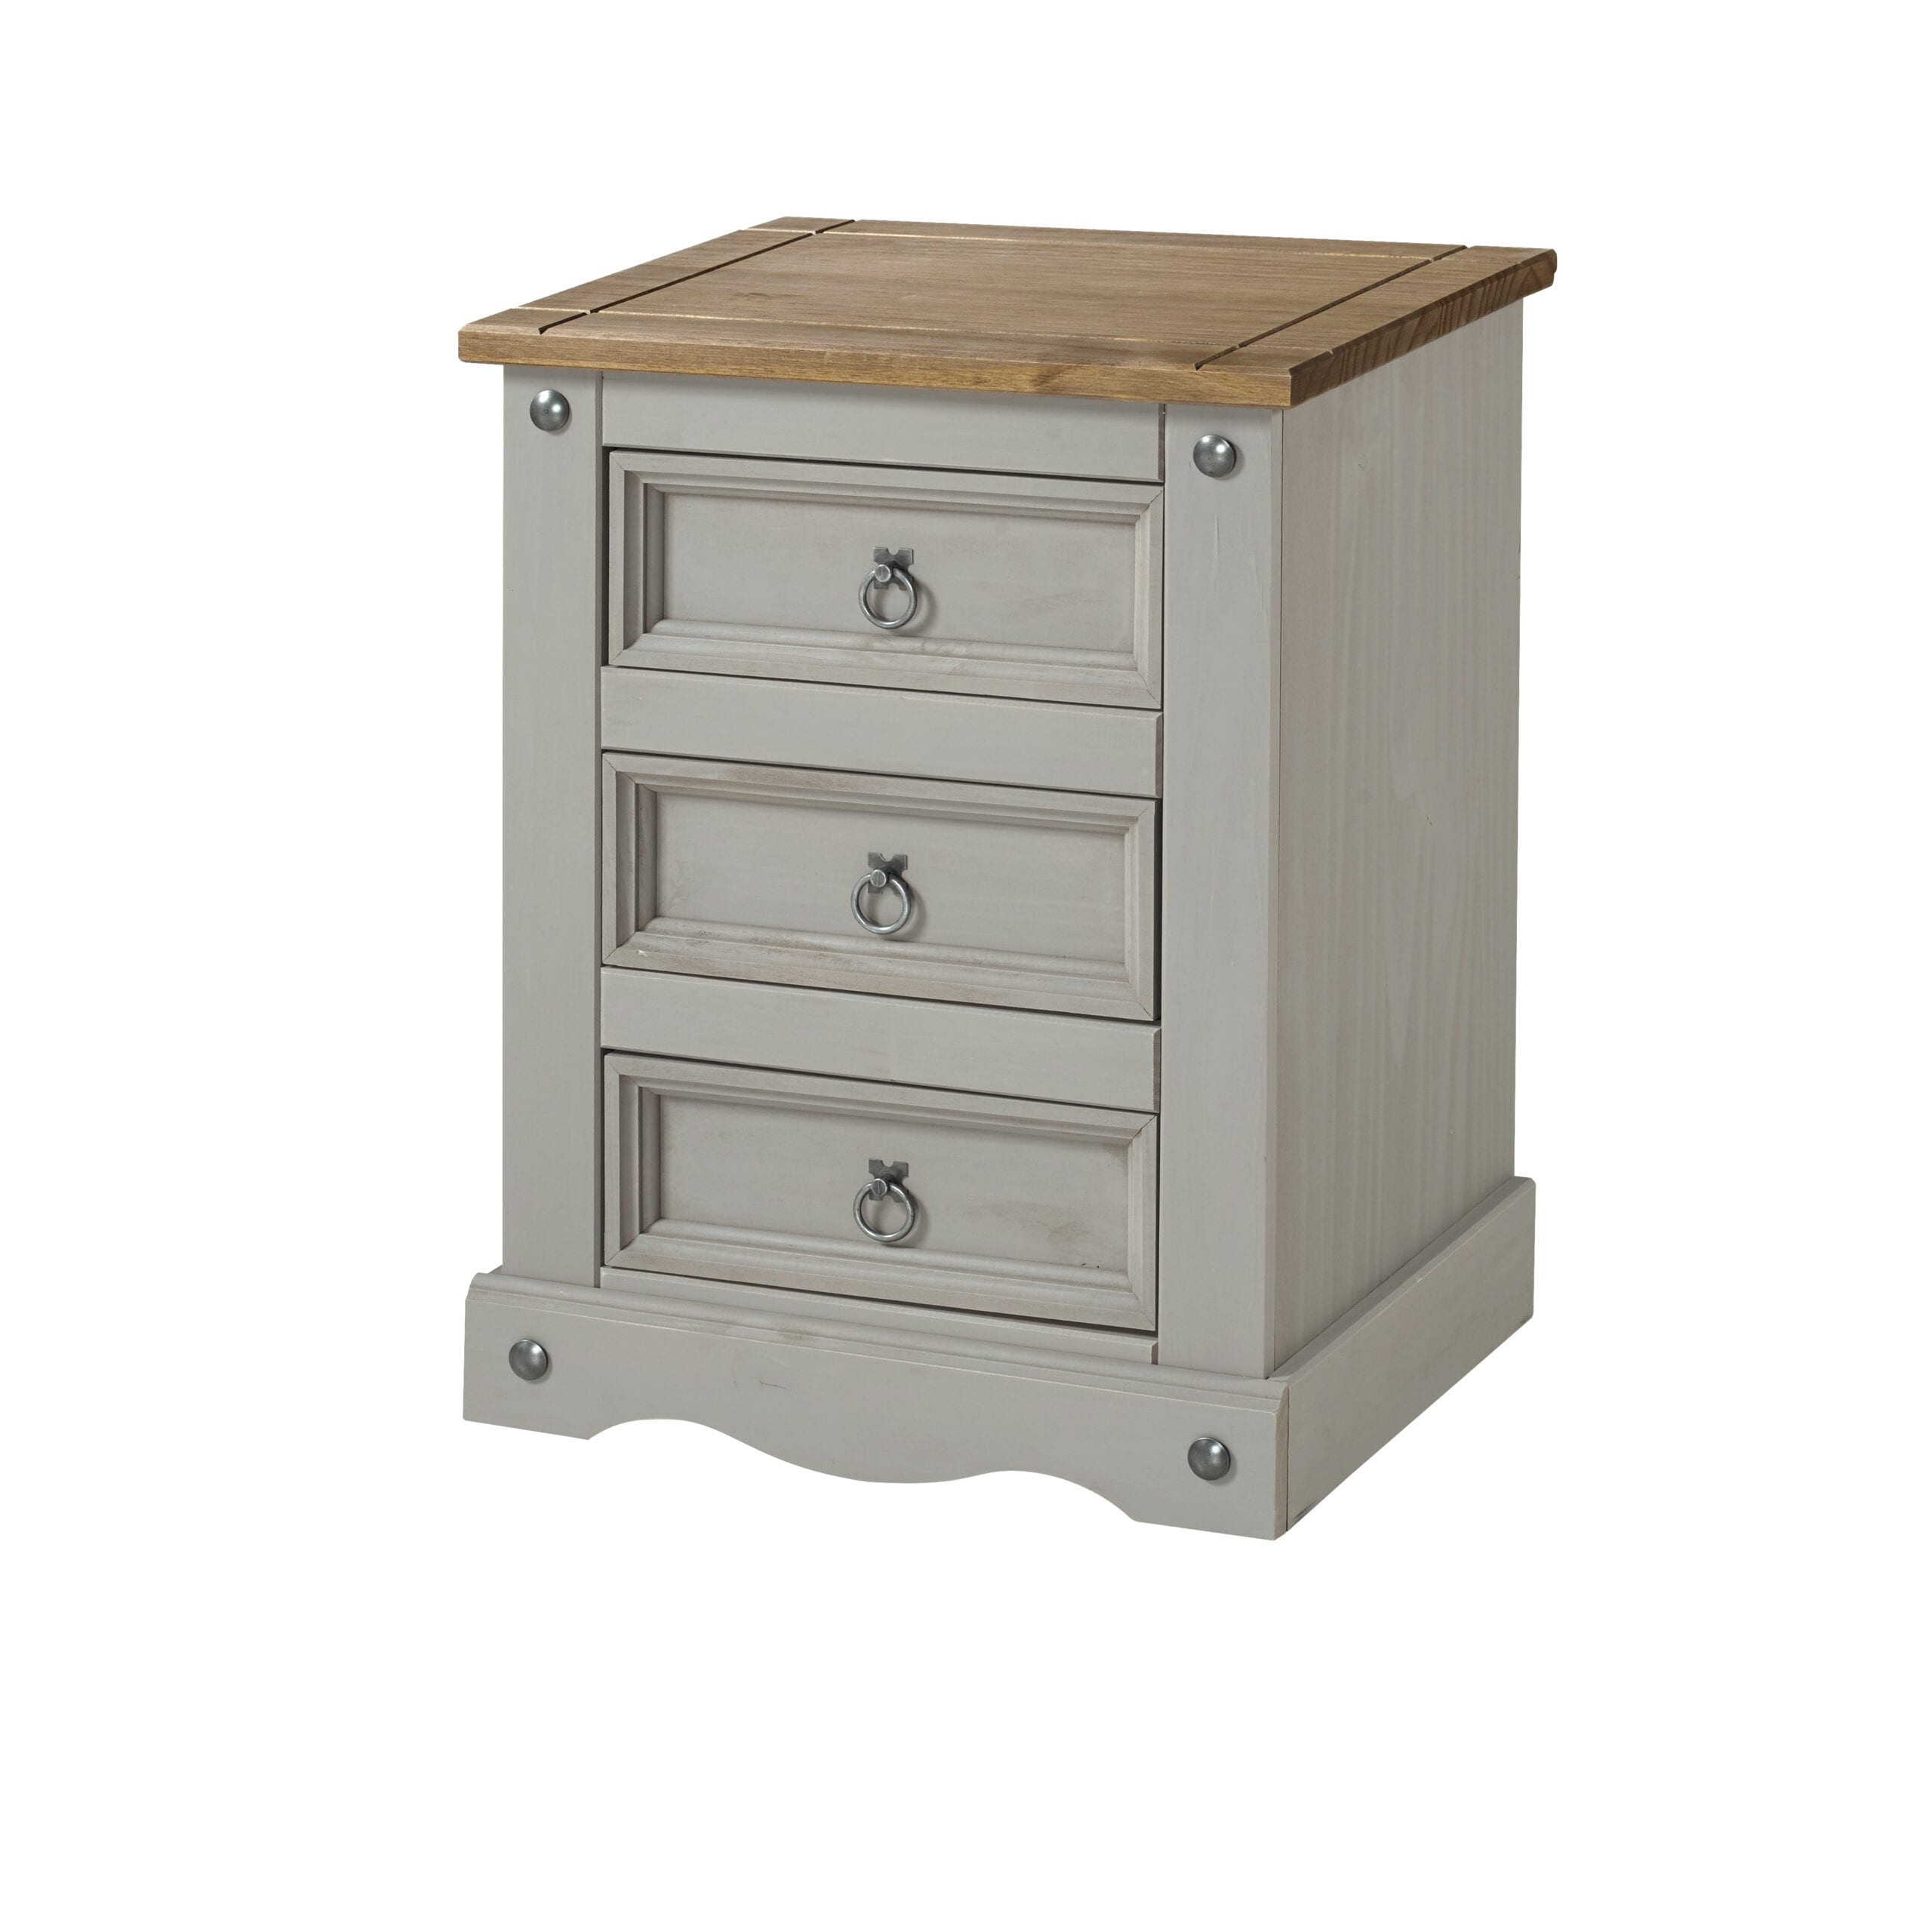 Coson Grey 3 drawer bedside cabinet